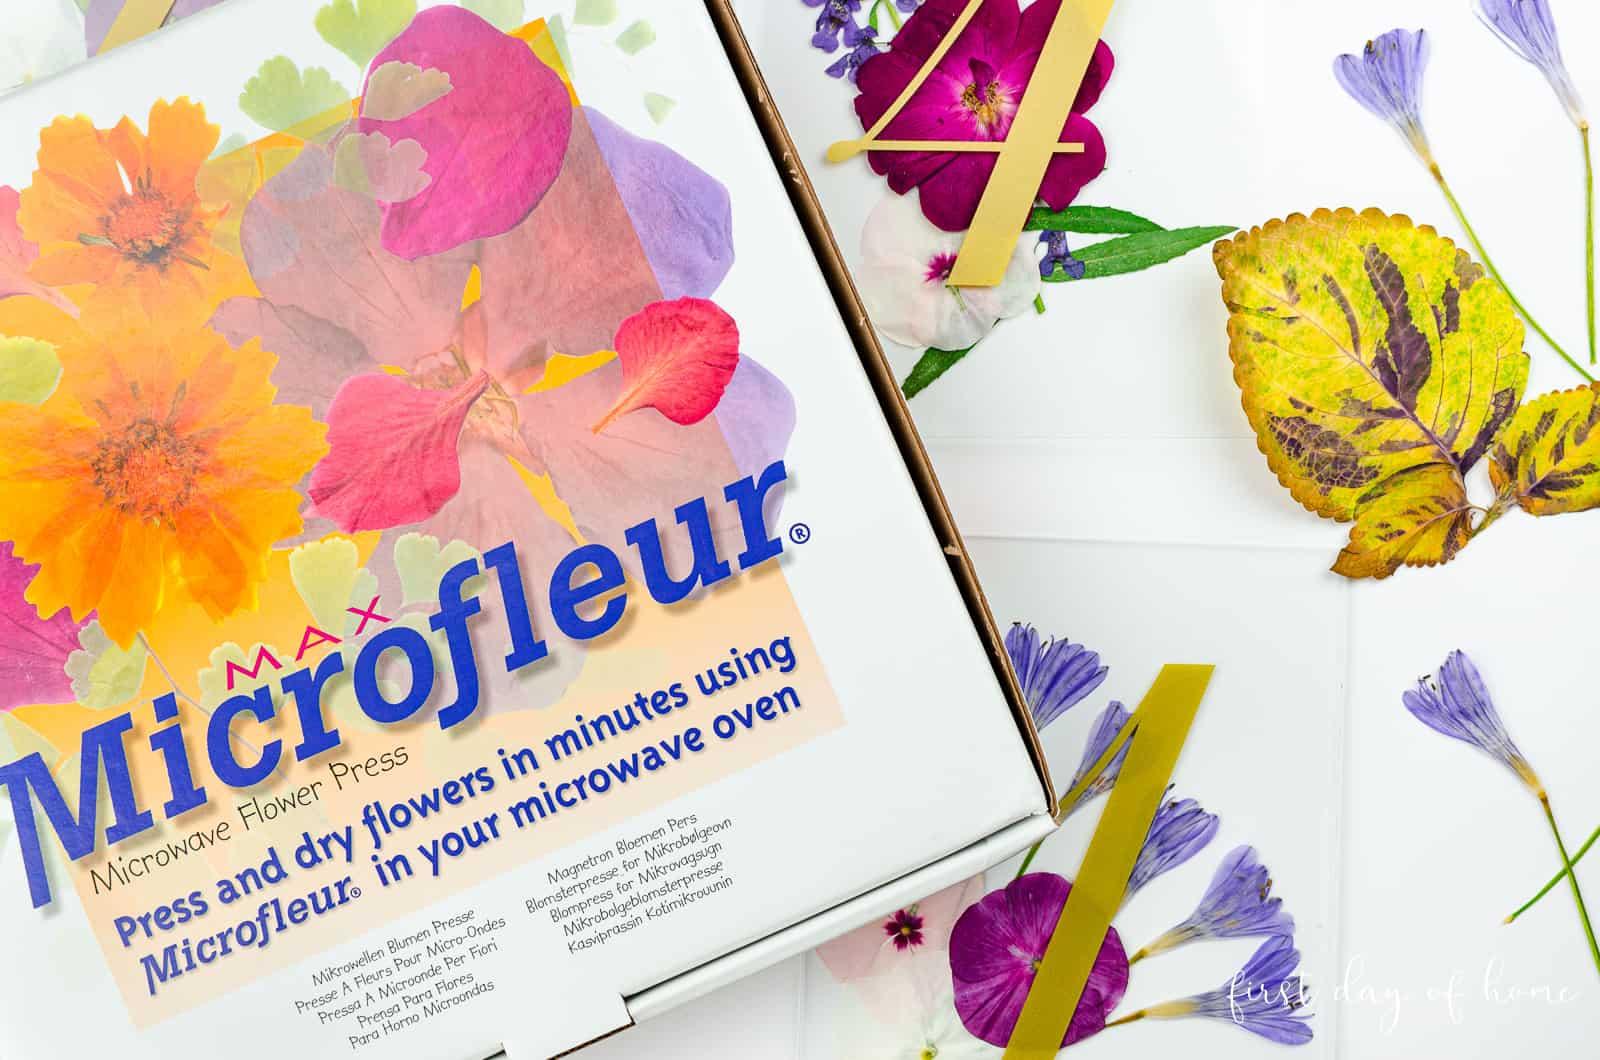 Microfleur microwave flower press to make wedding table number frames